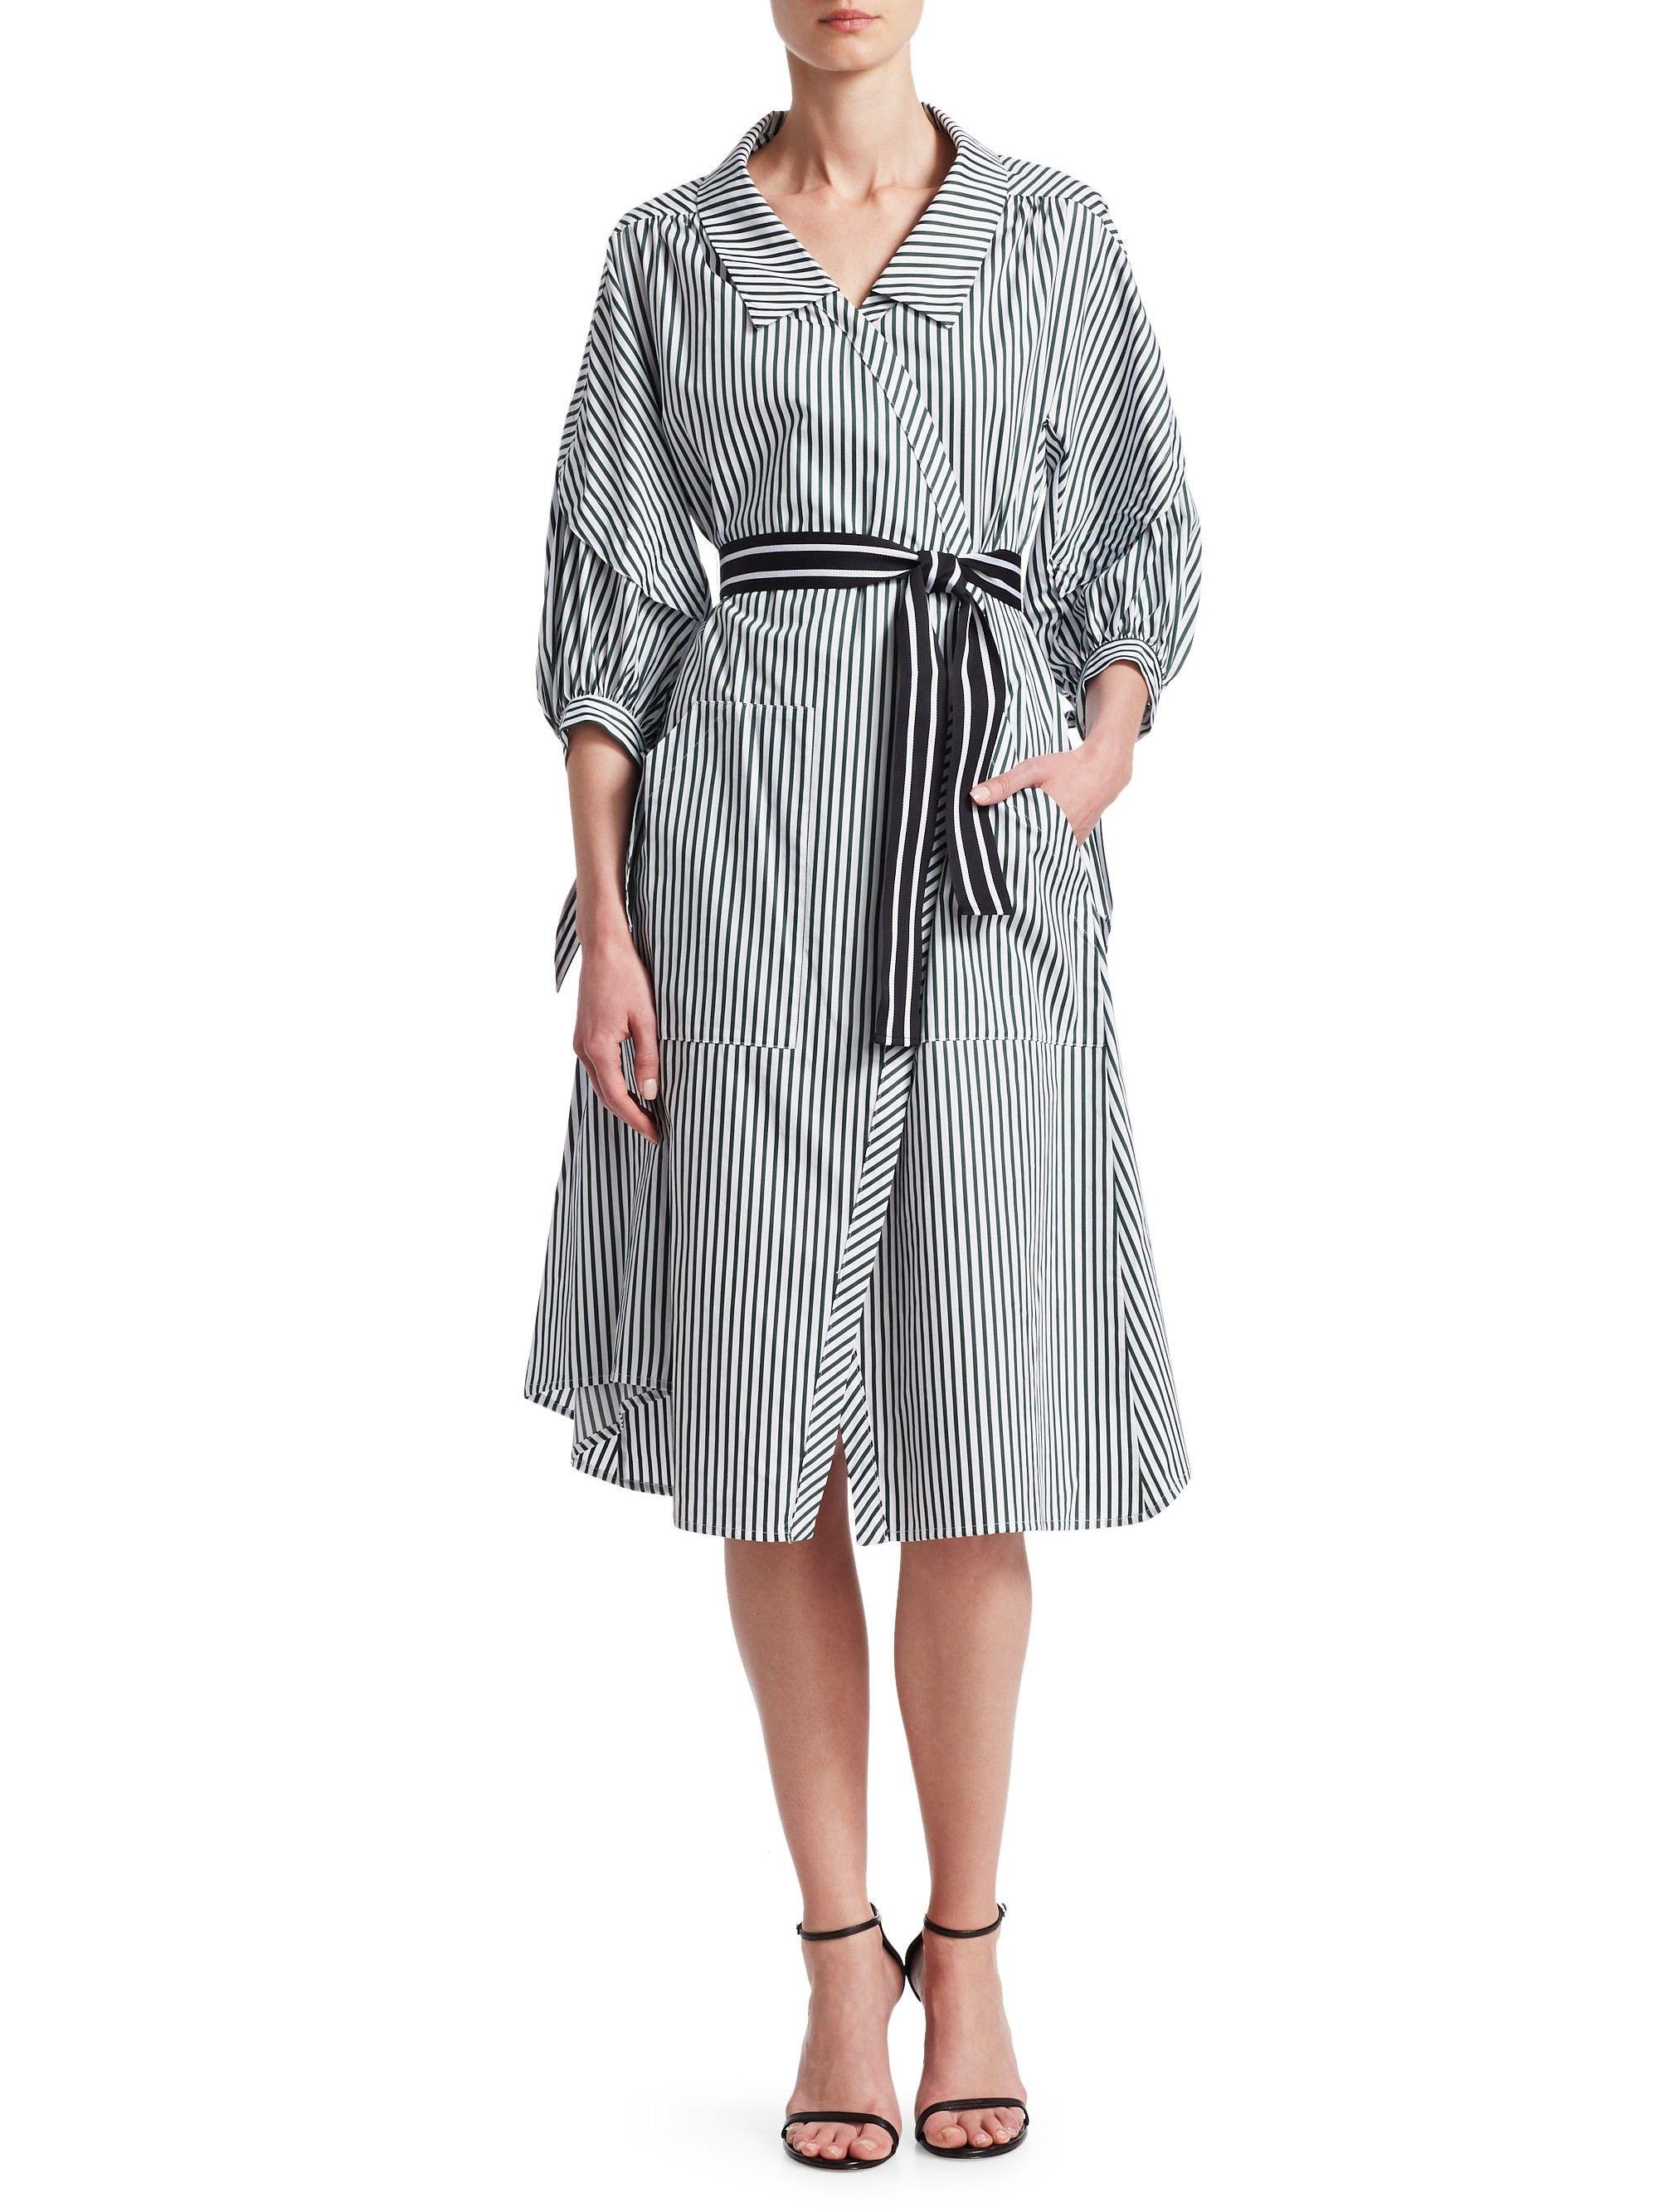 2da5222e57b Maje Rilucci A-Line Shirt Dress - Stripe 2 (Medium)